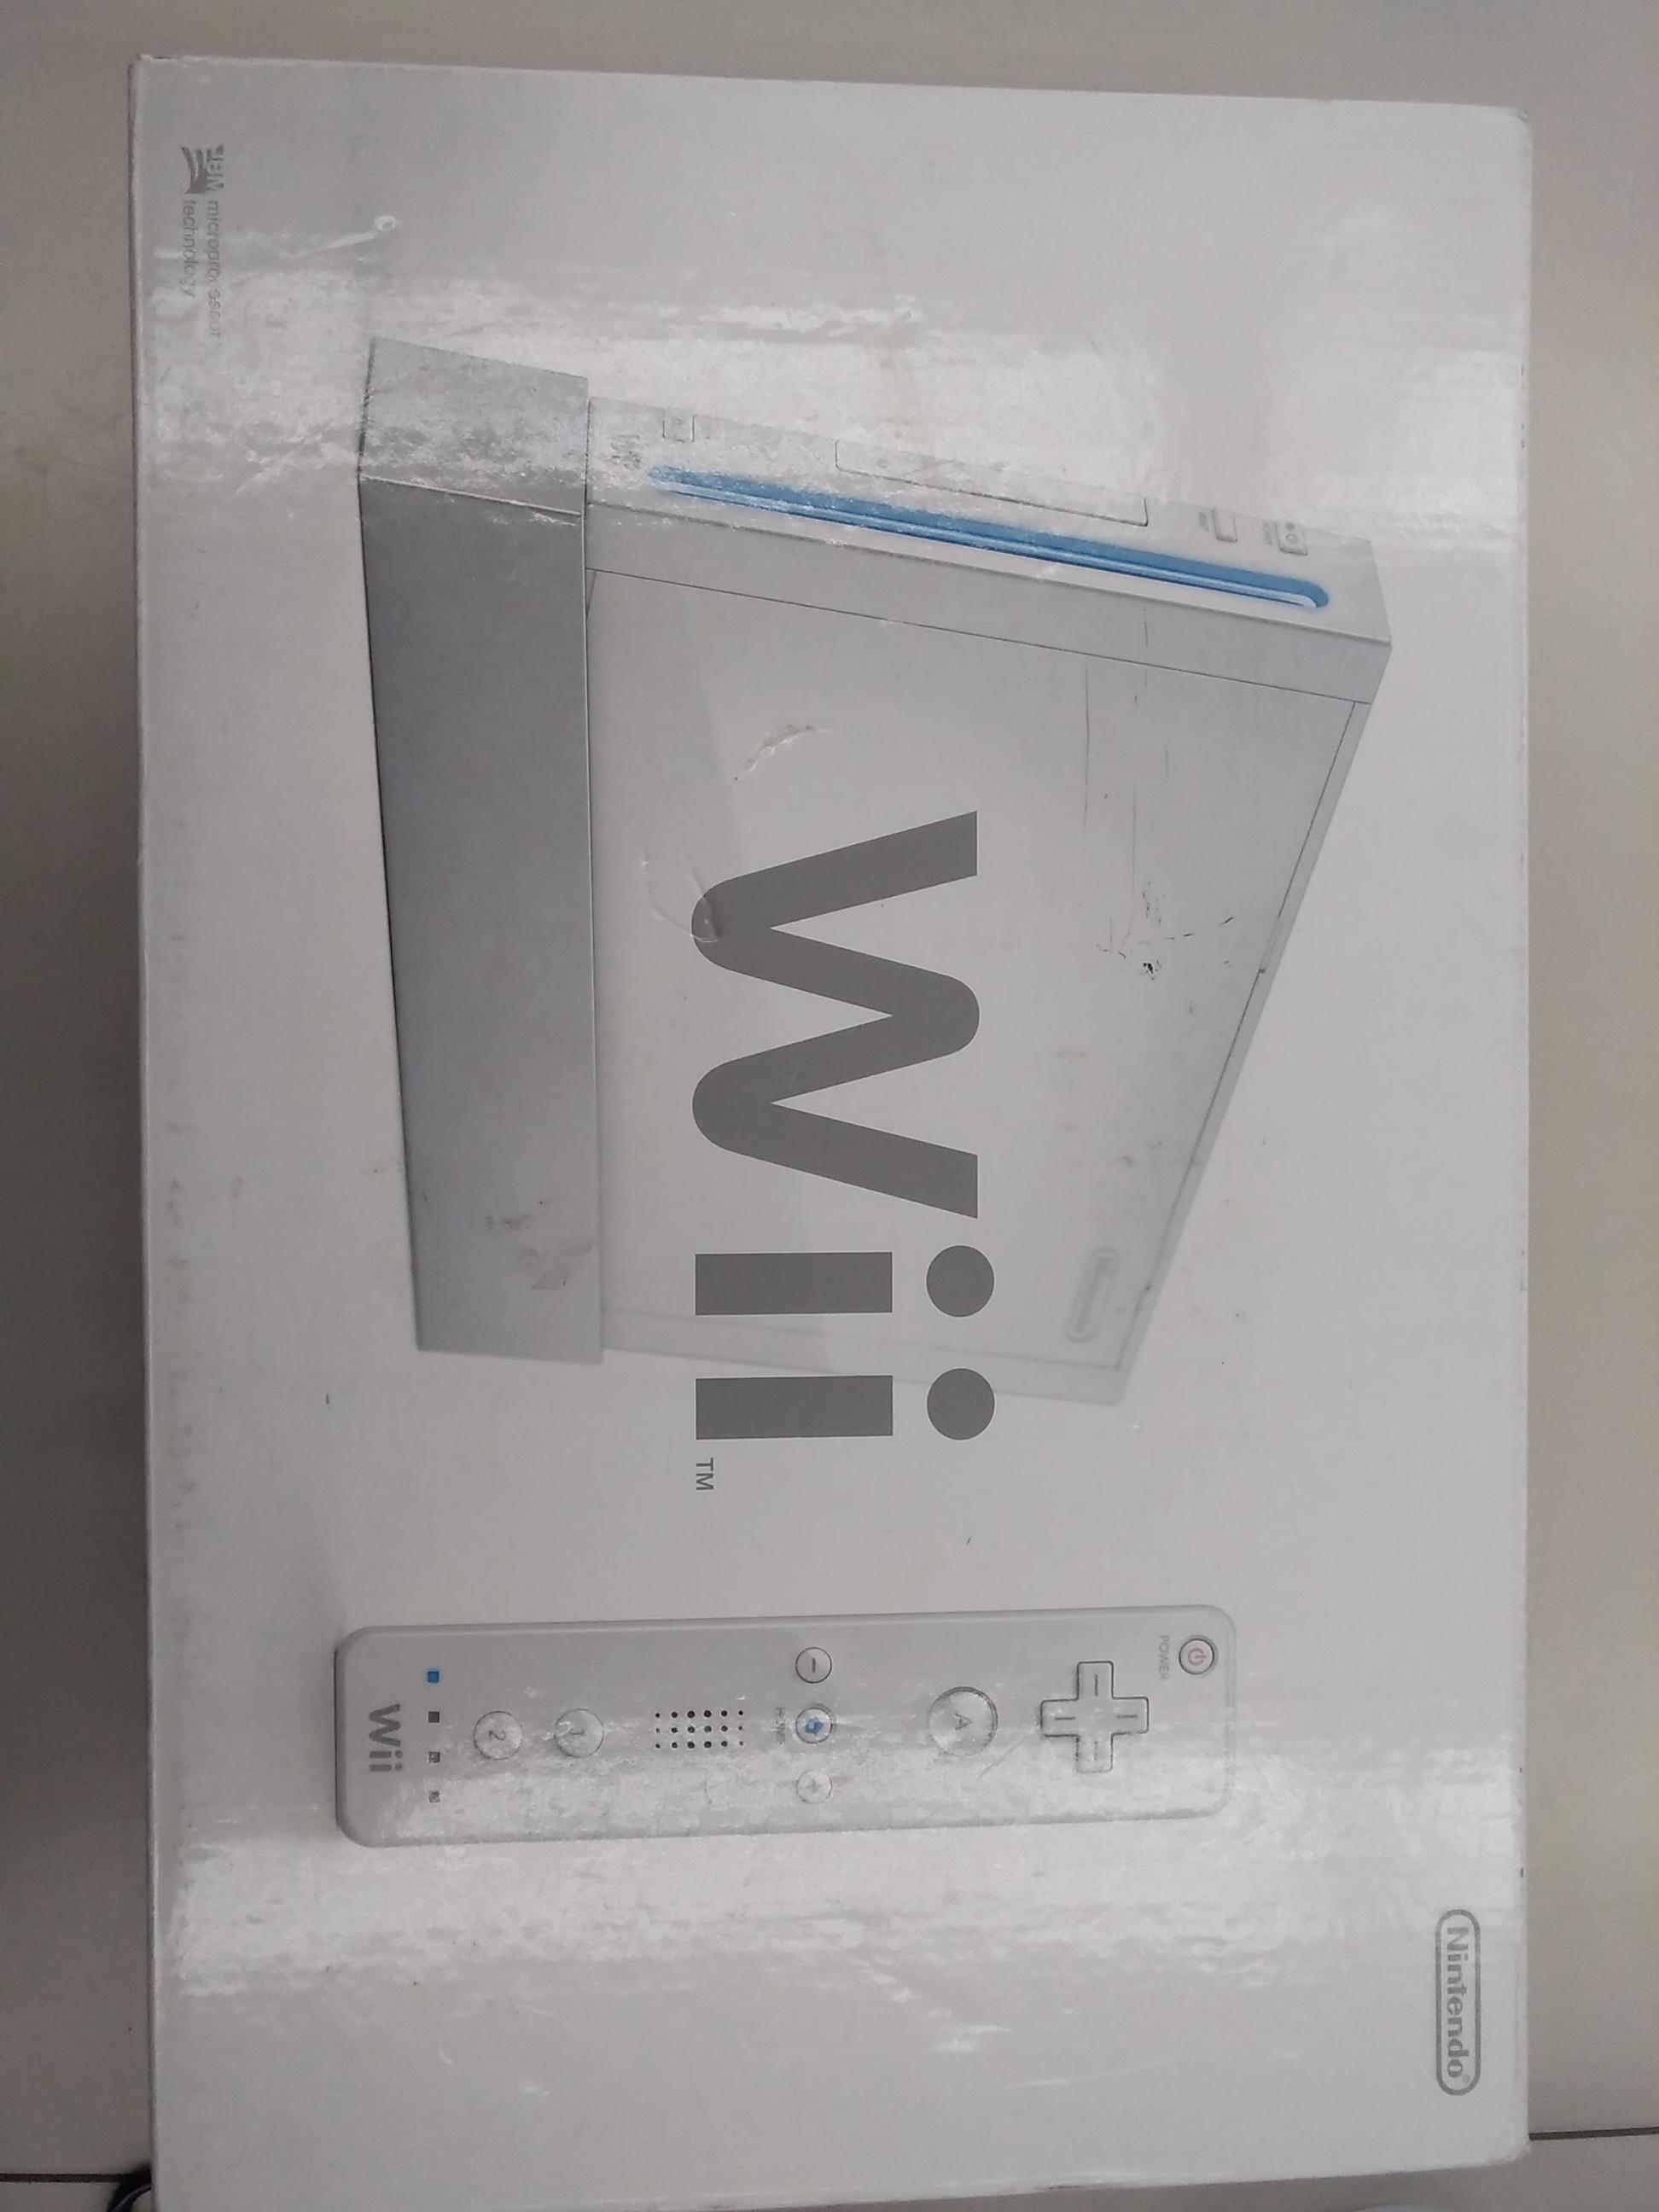 WII/RVL-001|NINTENDO